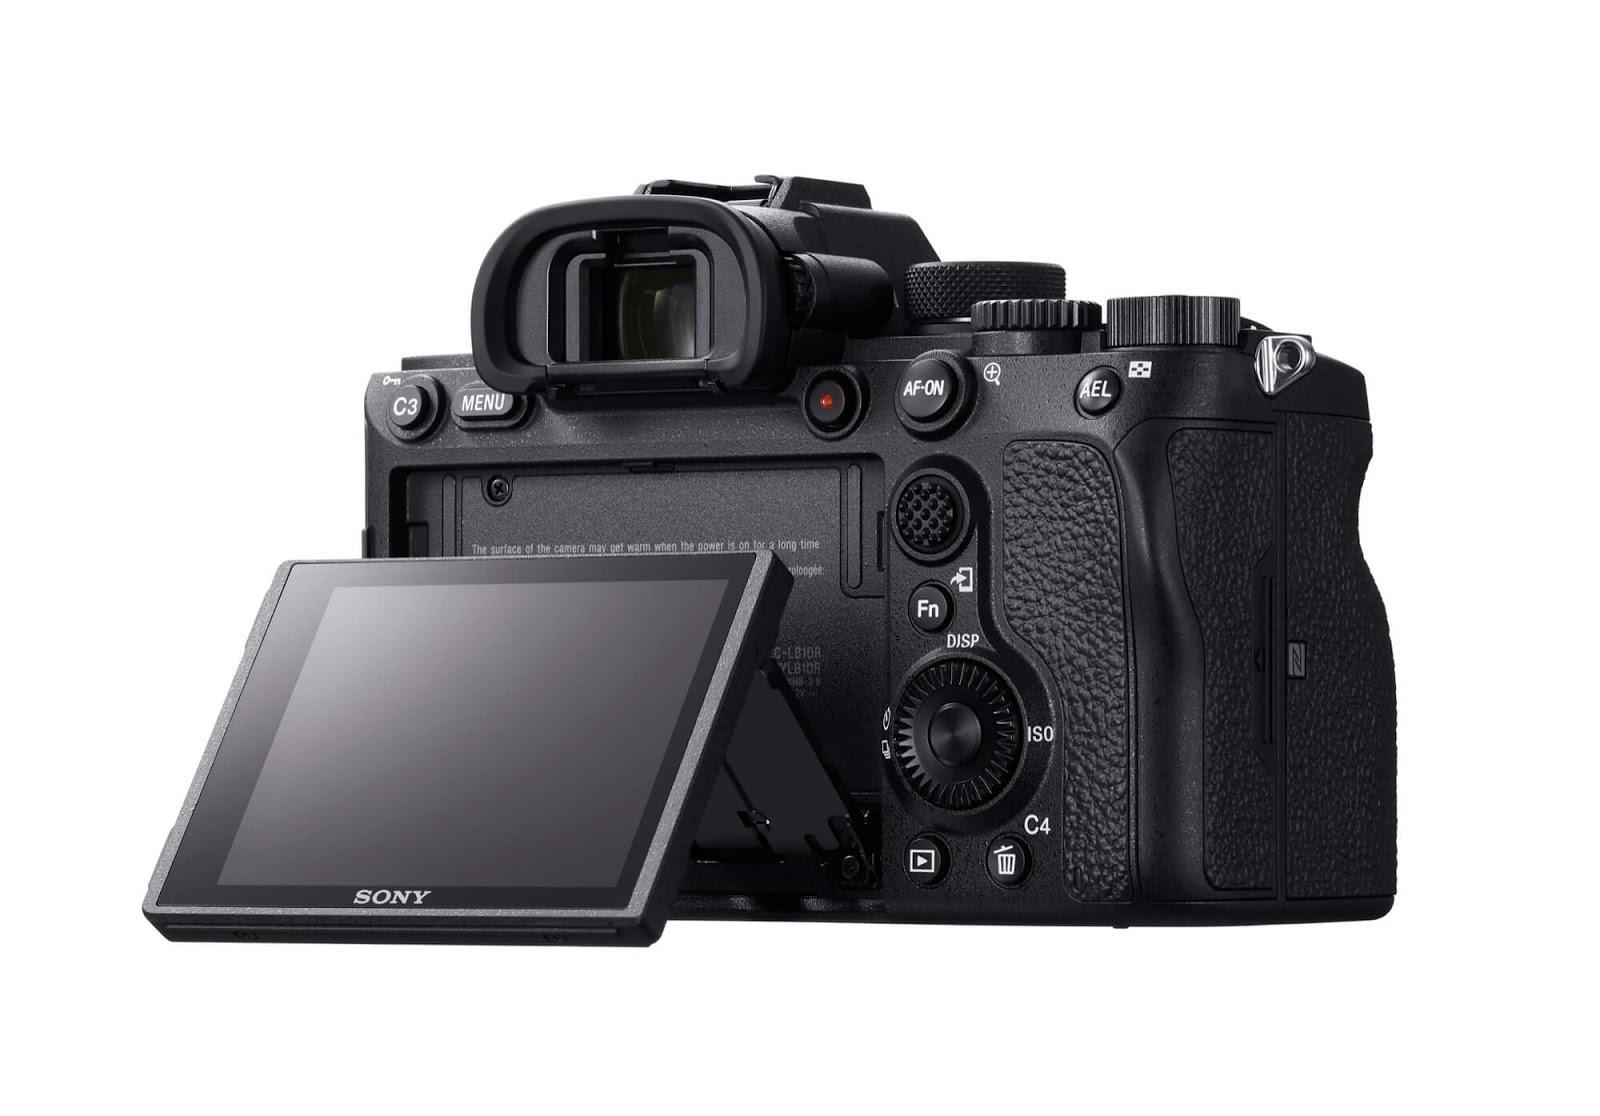 Sony Introduces α7R IV World's First 35mm Full-Frame 61 MP Back-Illuminated Exmor R™ CMOS Image Sensor